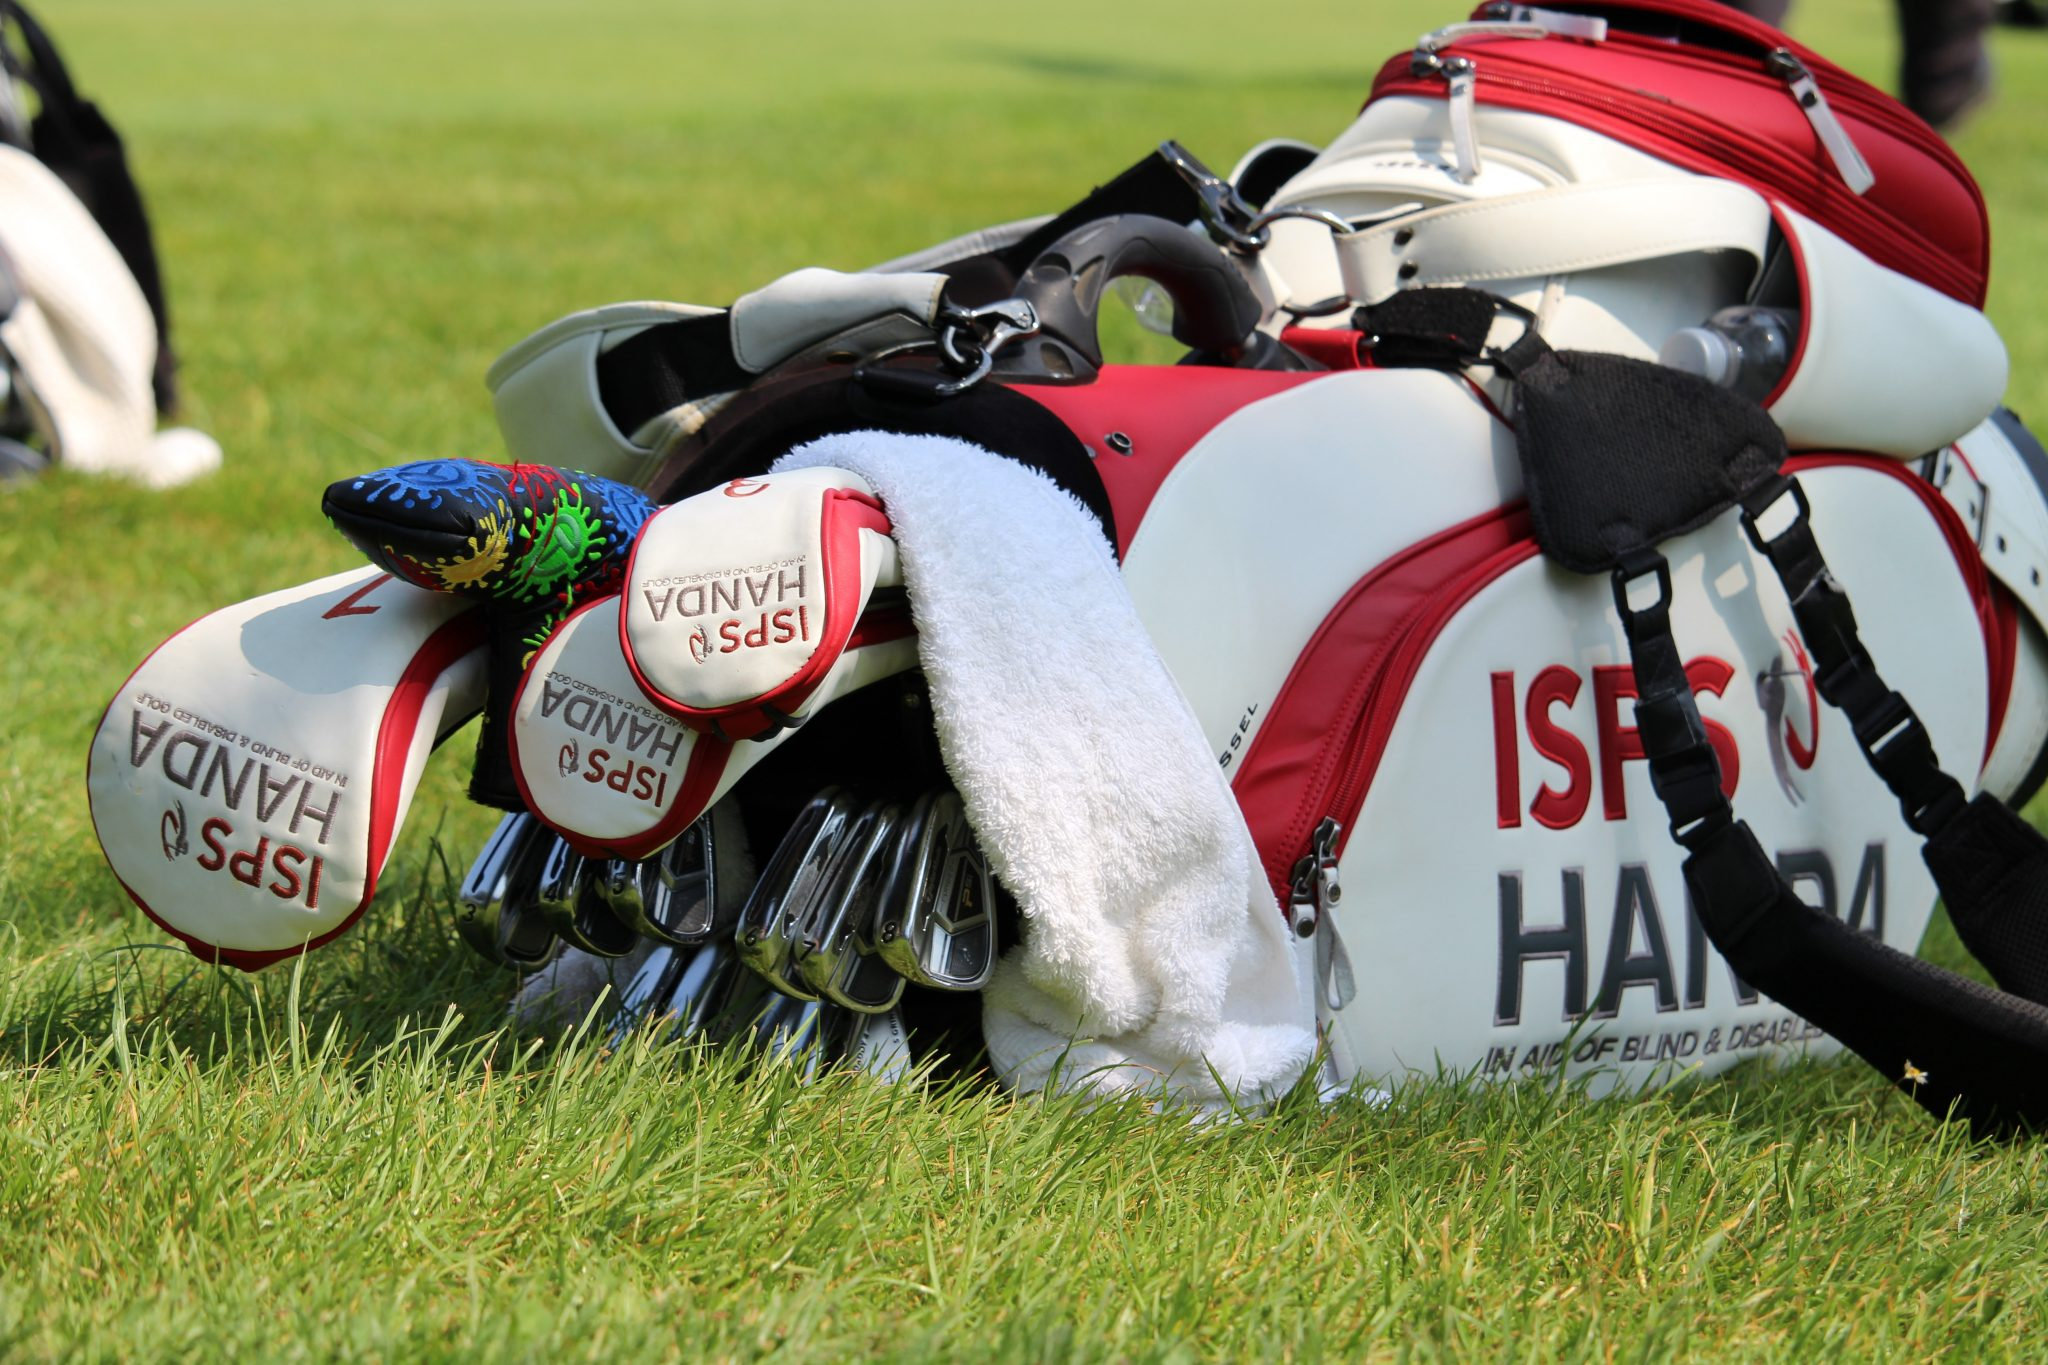 2018 PGA Championship – Round 1 & 2 Tee Times